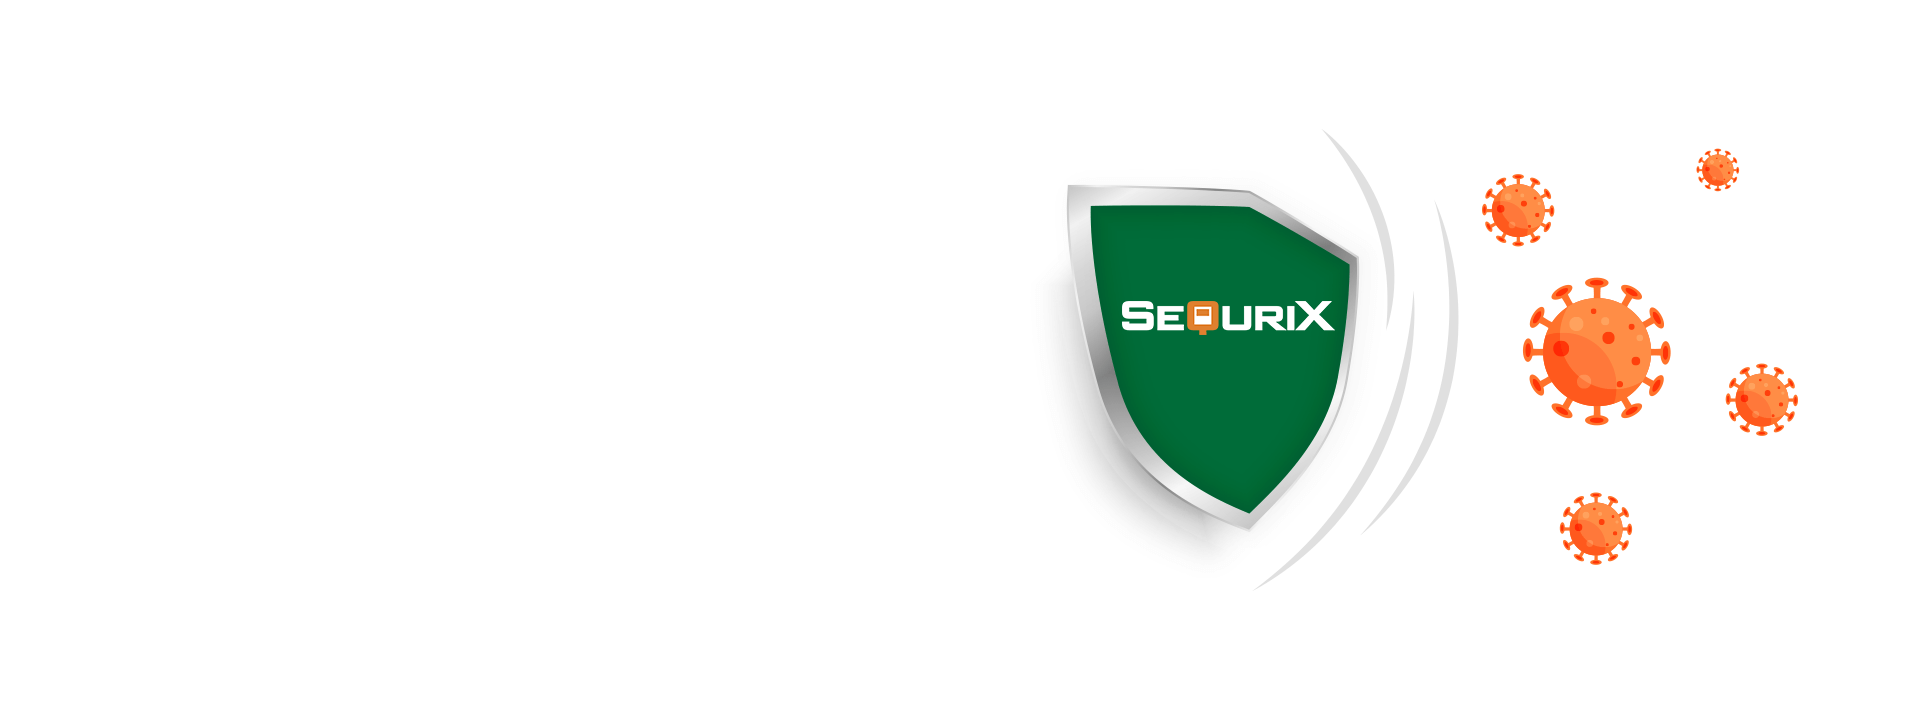 Corona SequriX